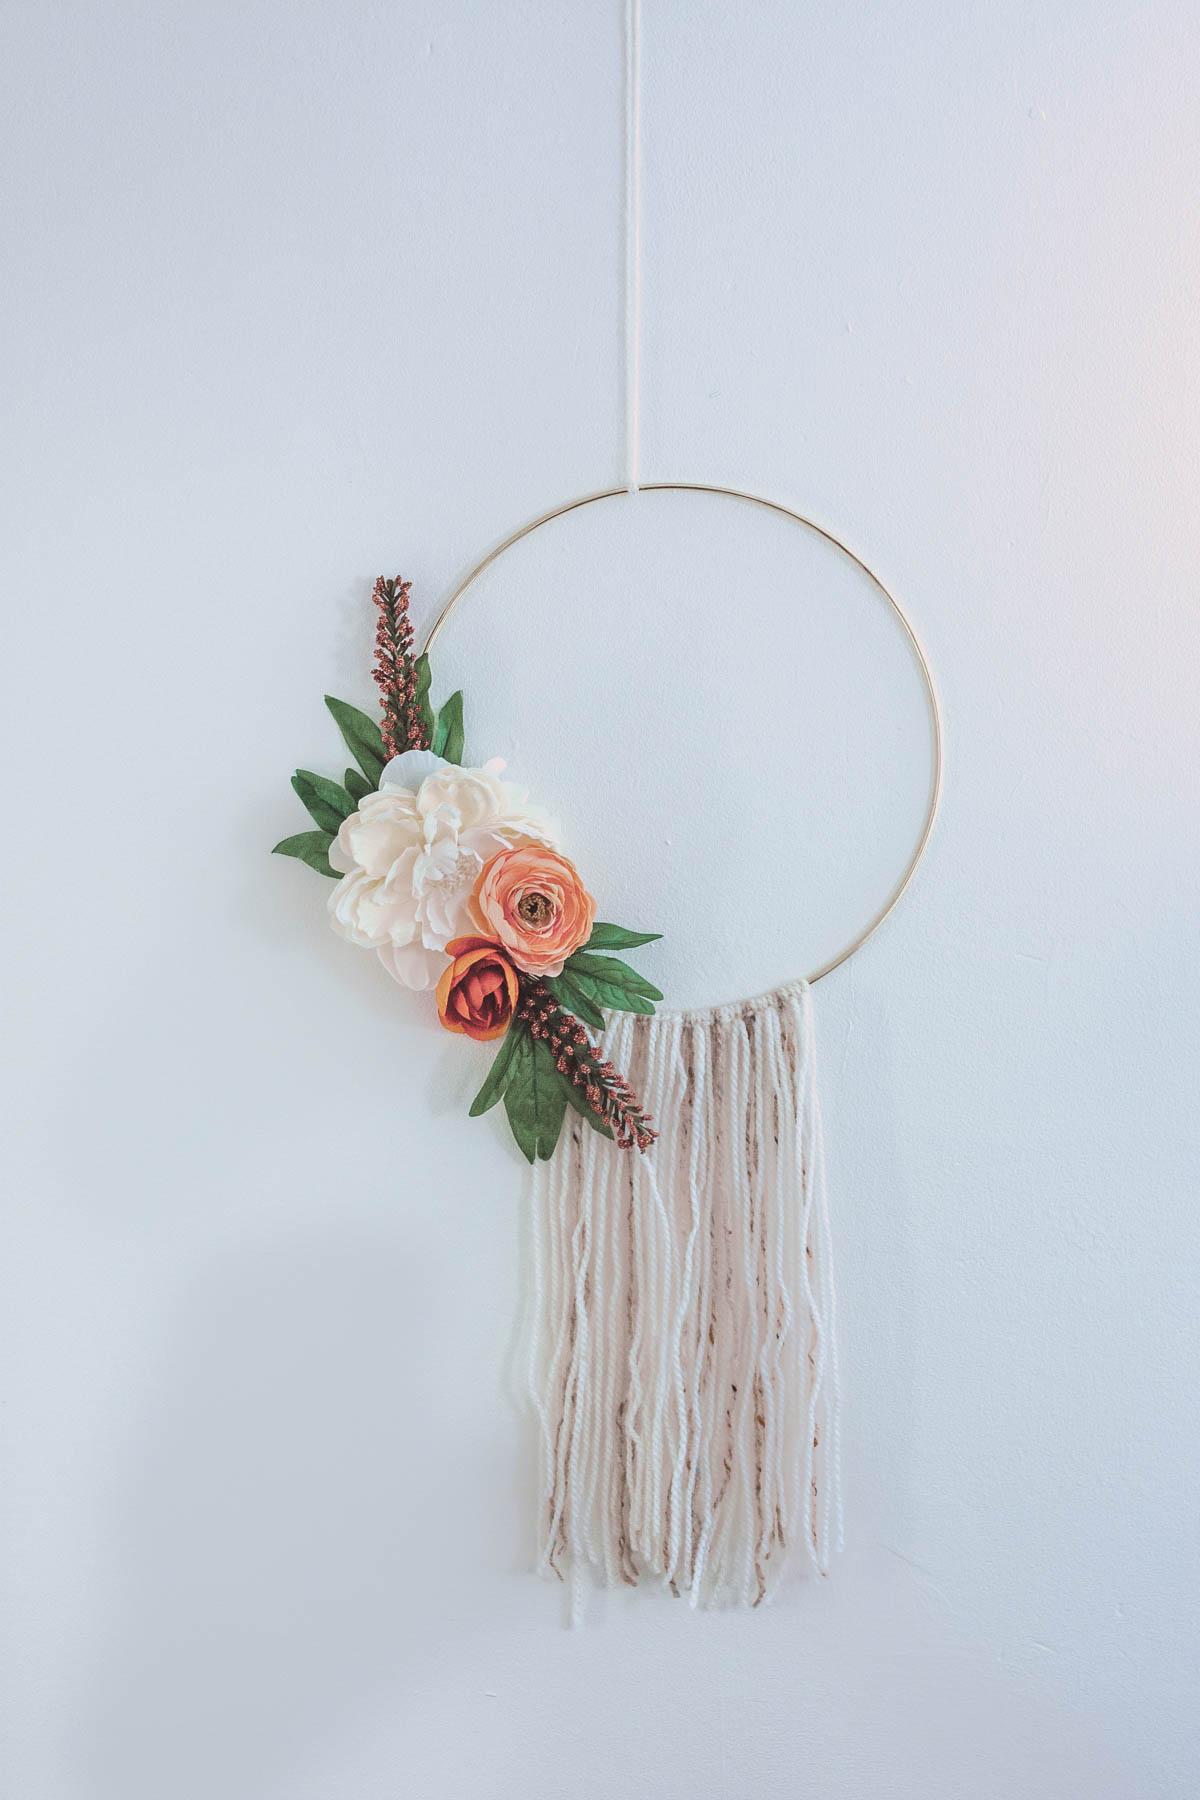 Modern Fall Wreath - Floral Hoop Wreath